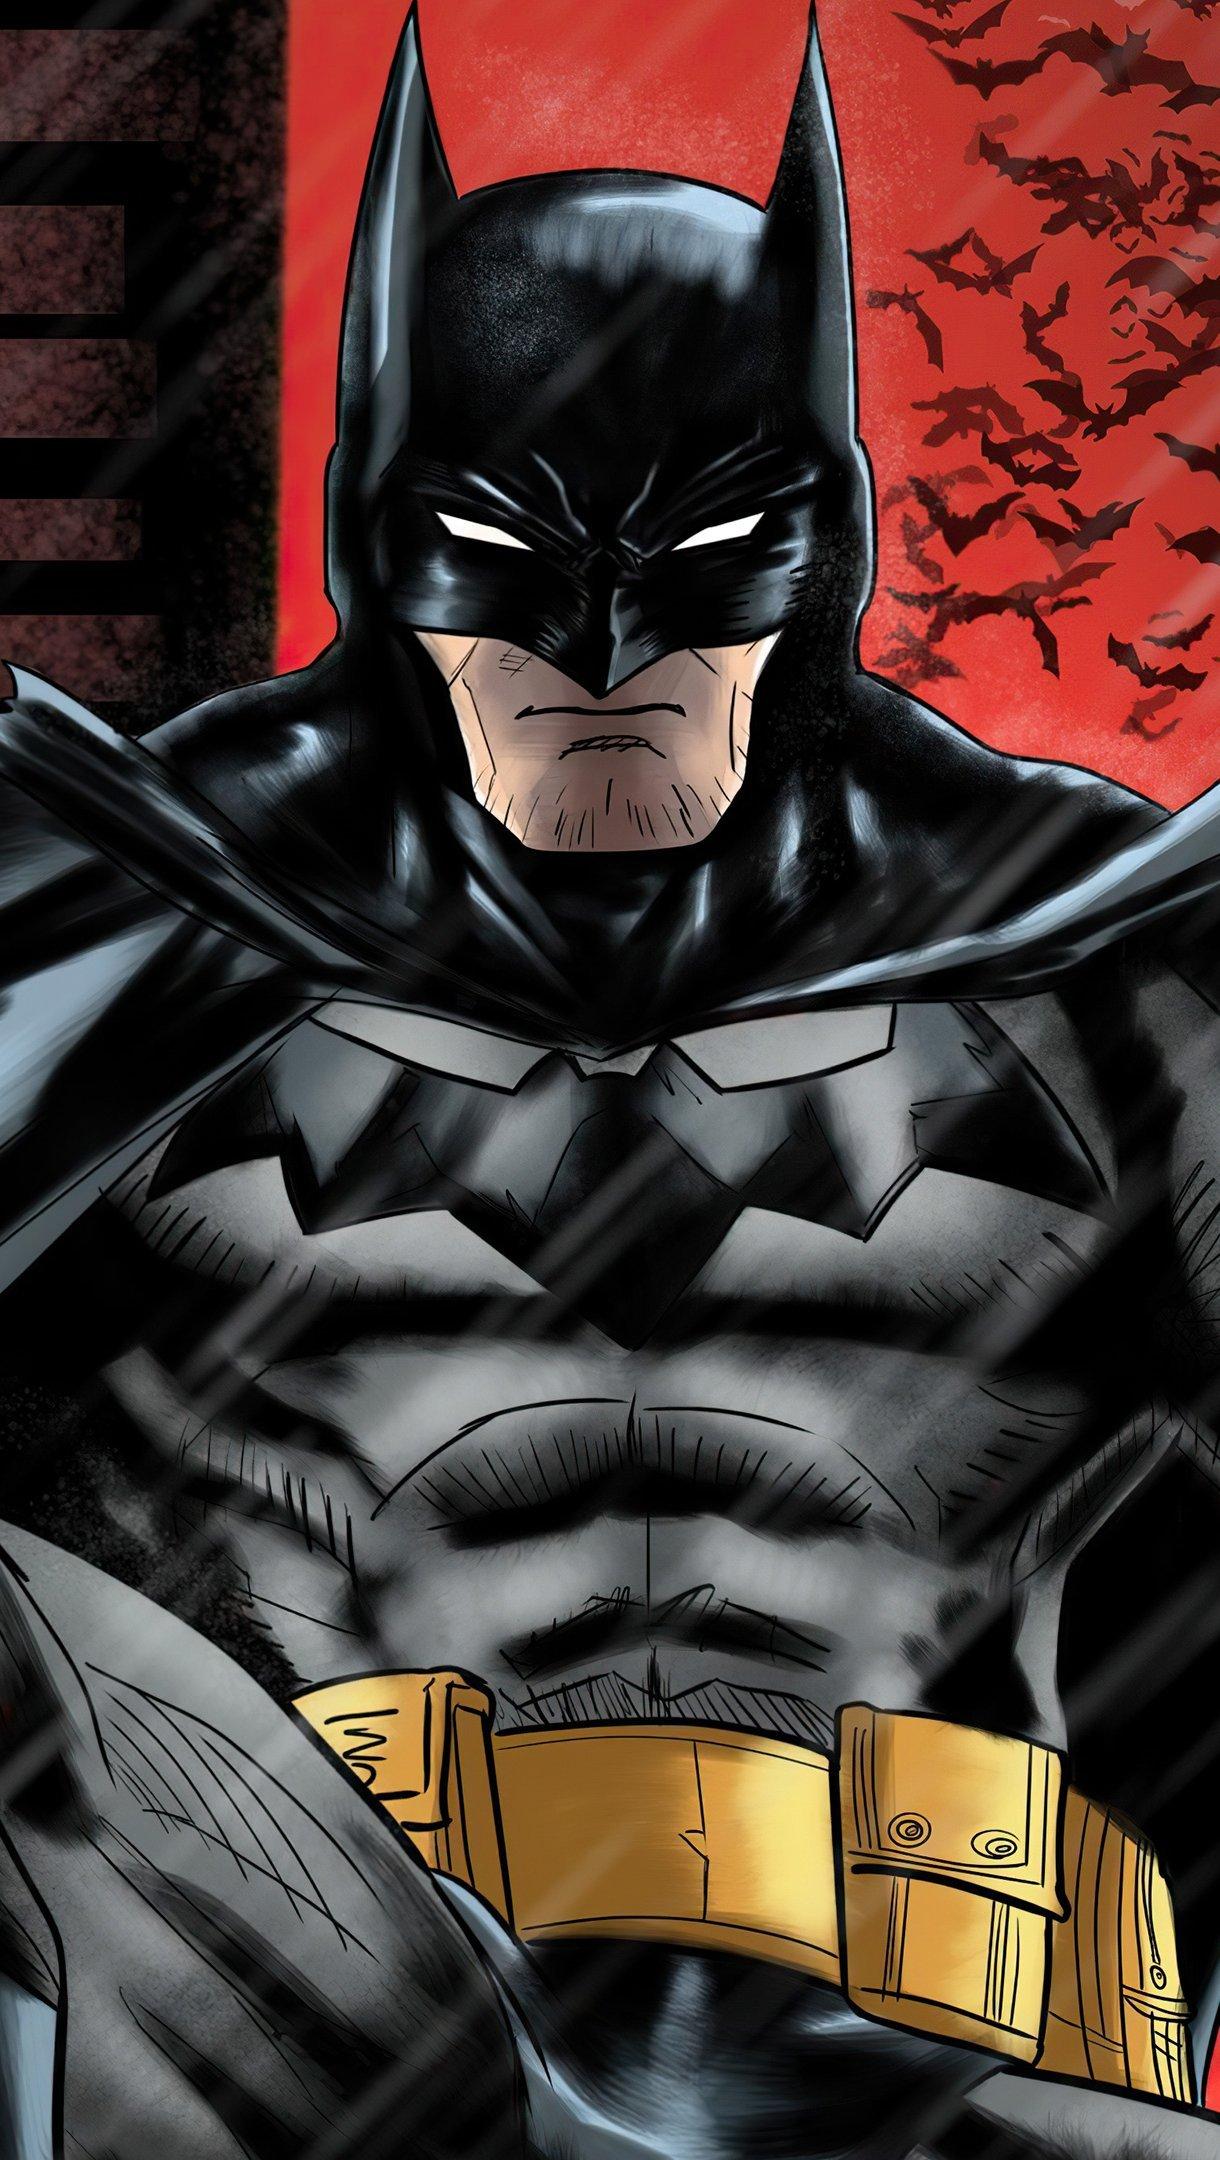 Fondos de pantalla Batman Ilutración digital Vertical